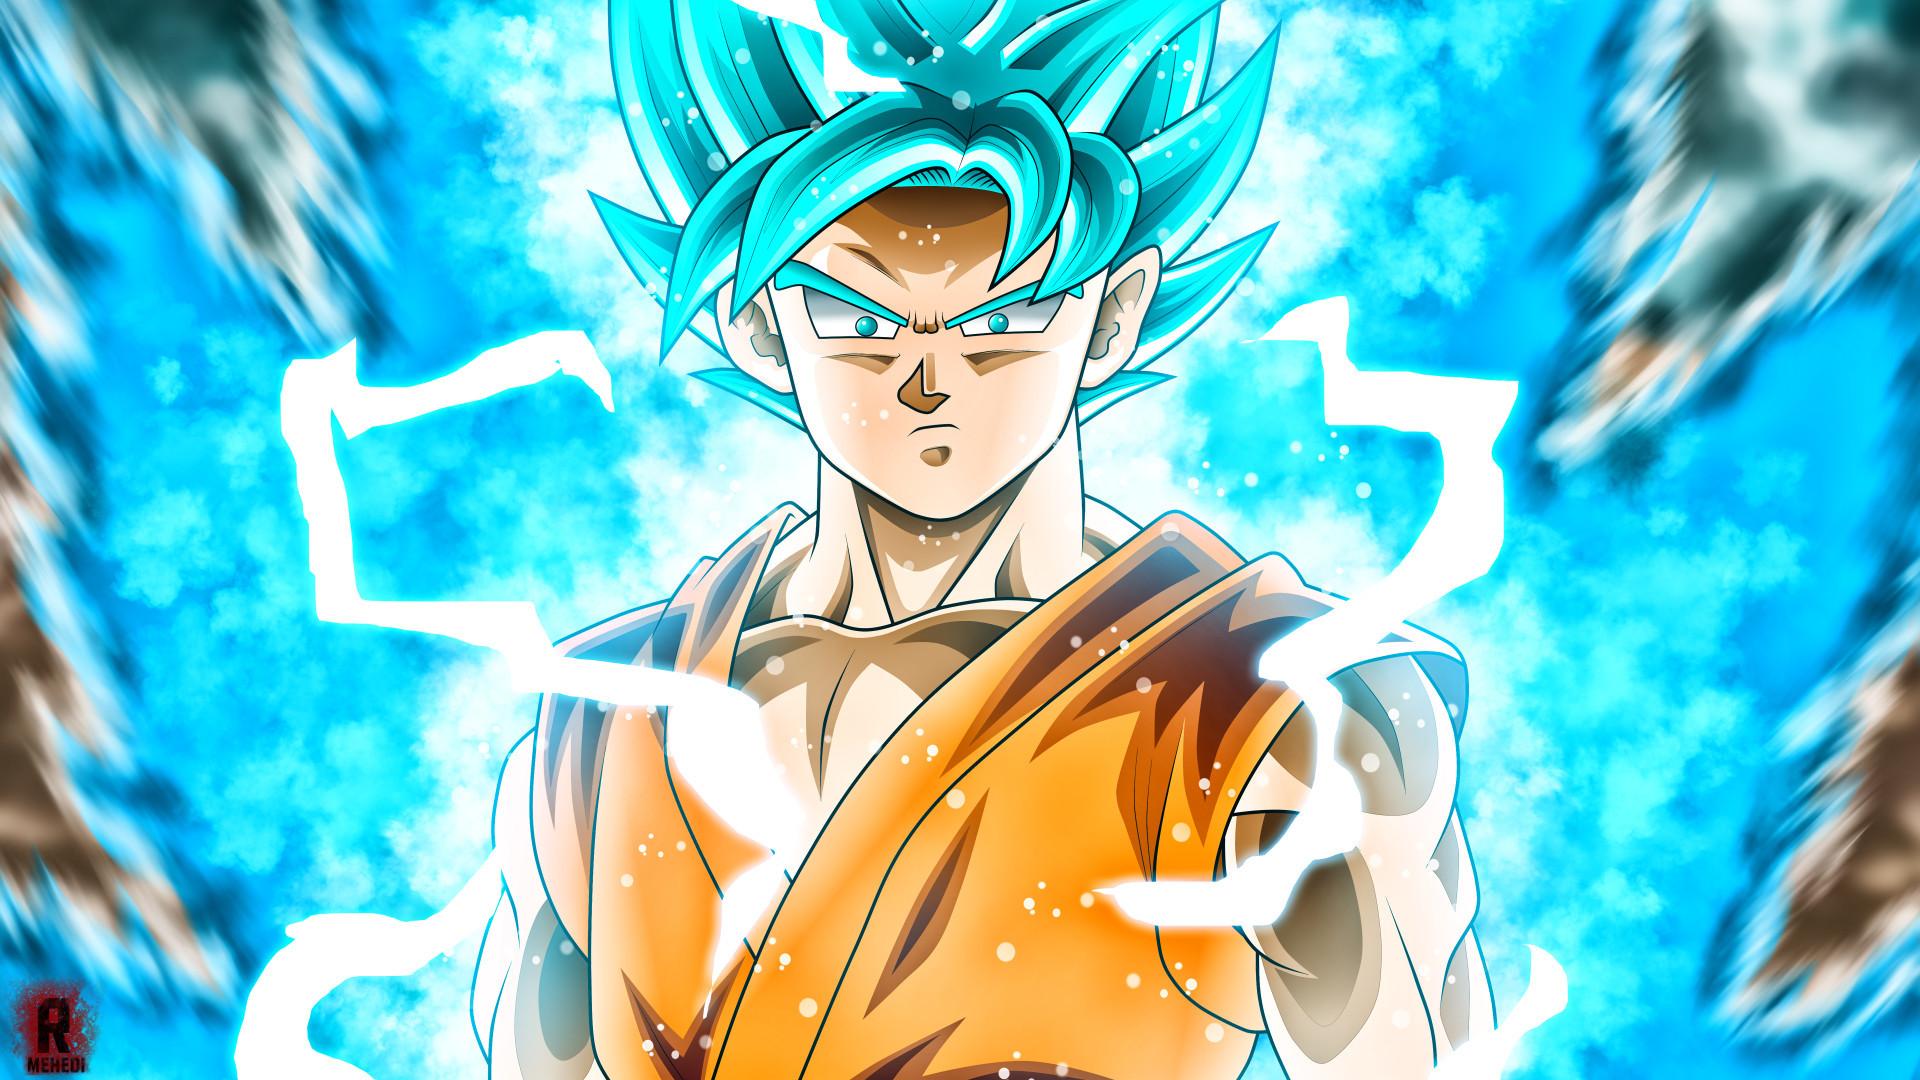 Goku Super Saiyan God Wallpaper HD Download Happy Mahashivratri 2017